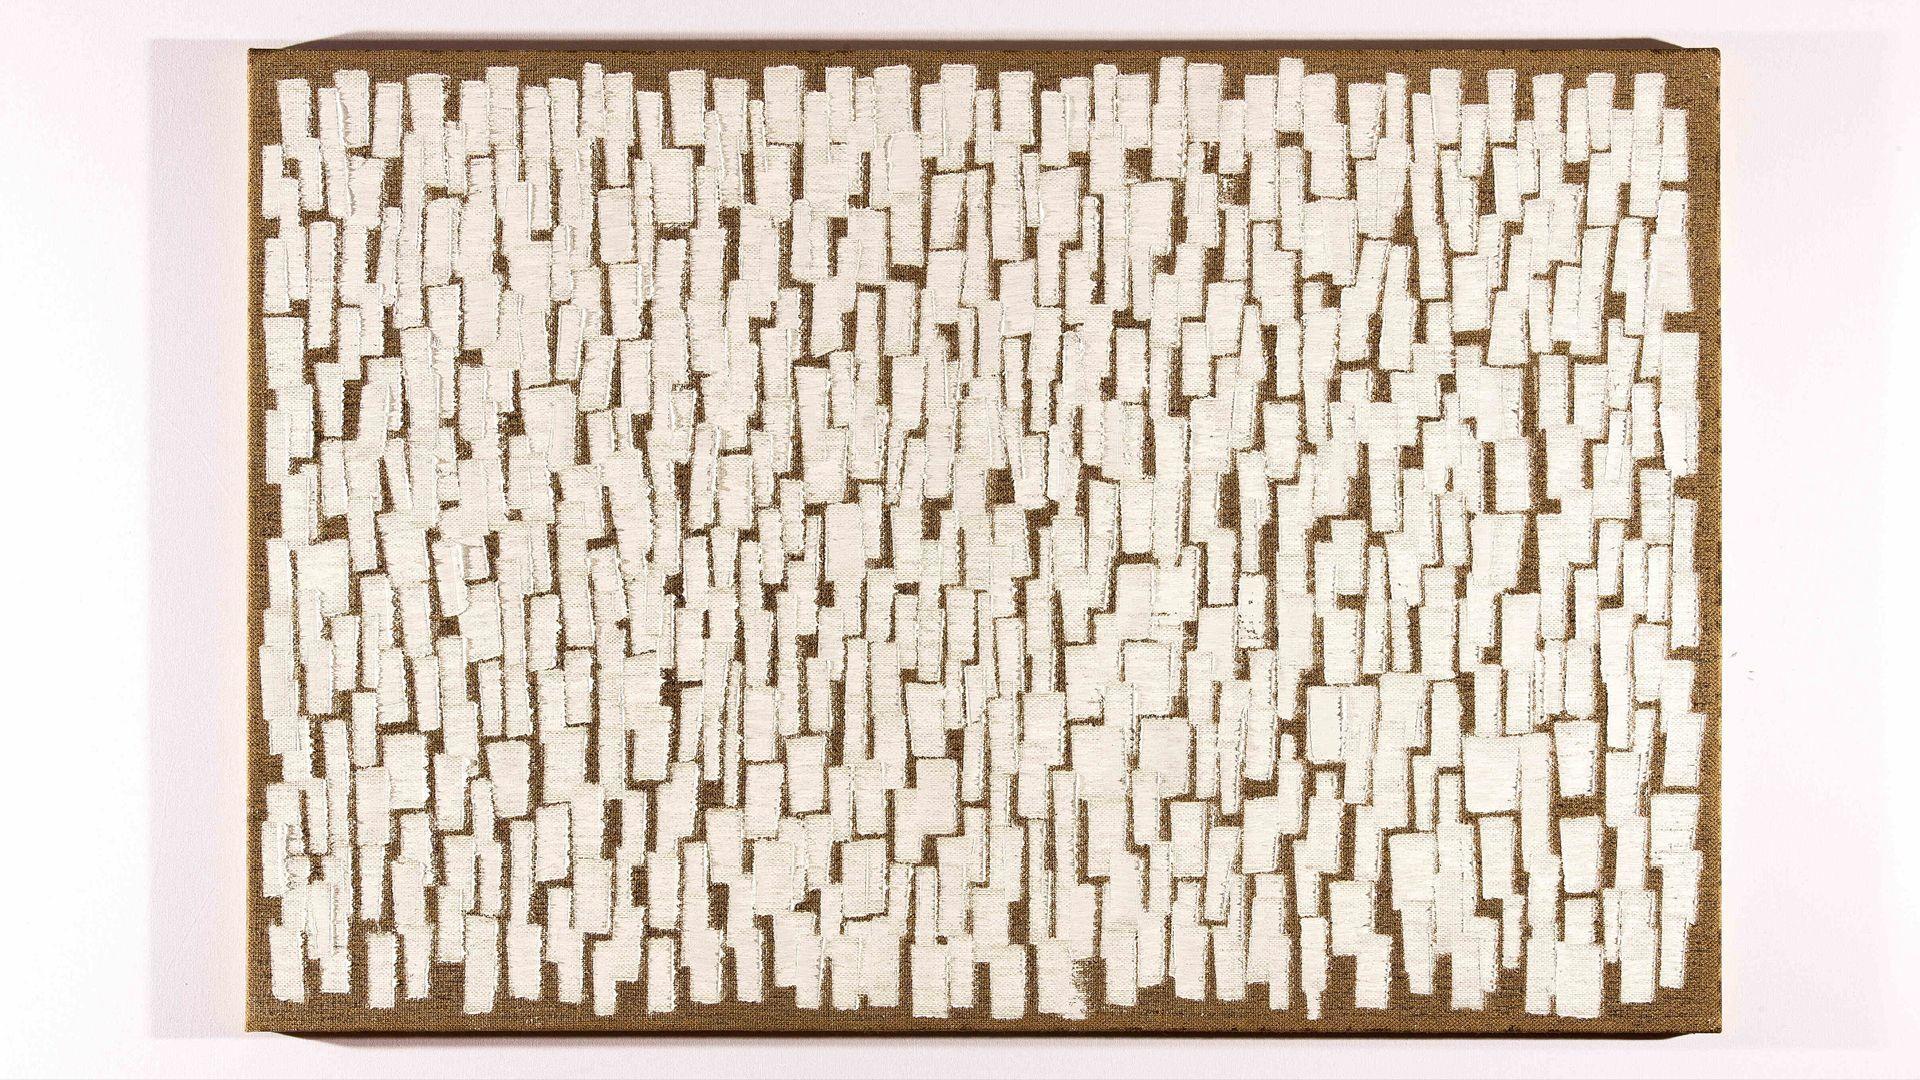 Art Brussels Sheds Light on the Forgotten